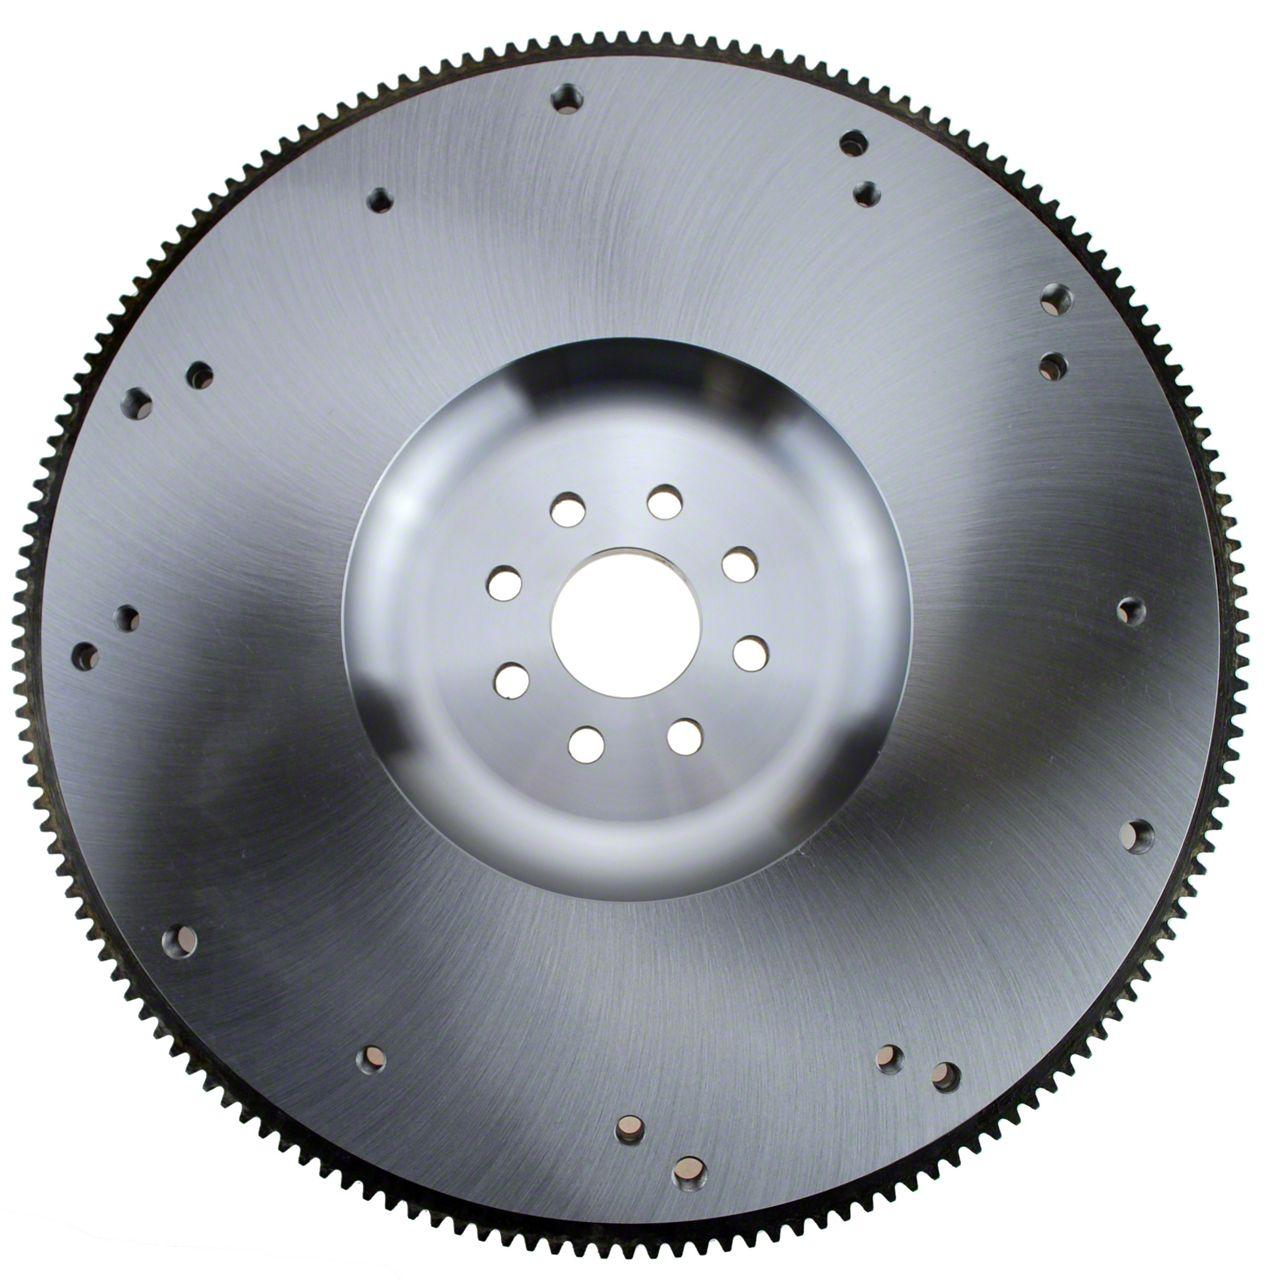 Add RAM Flywheel (required for installation)